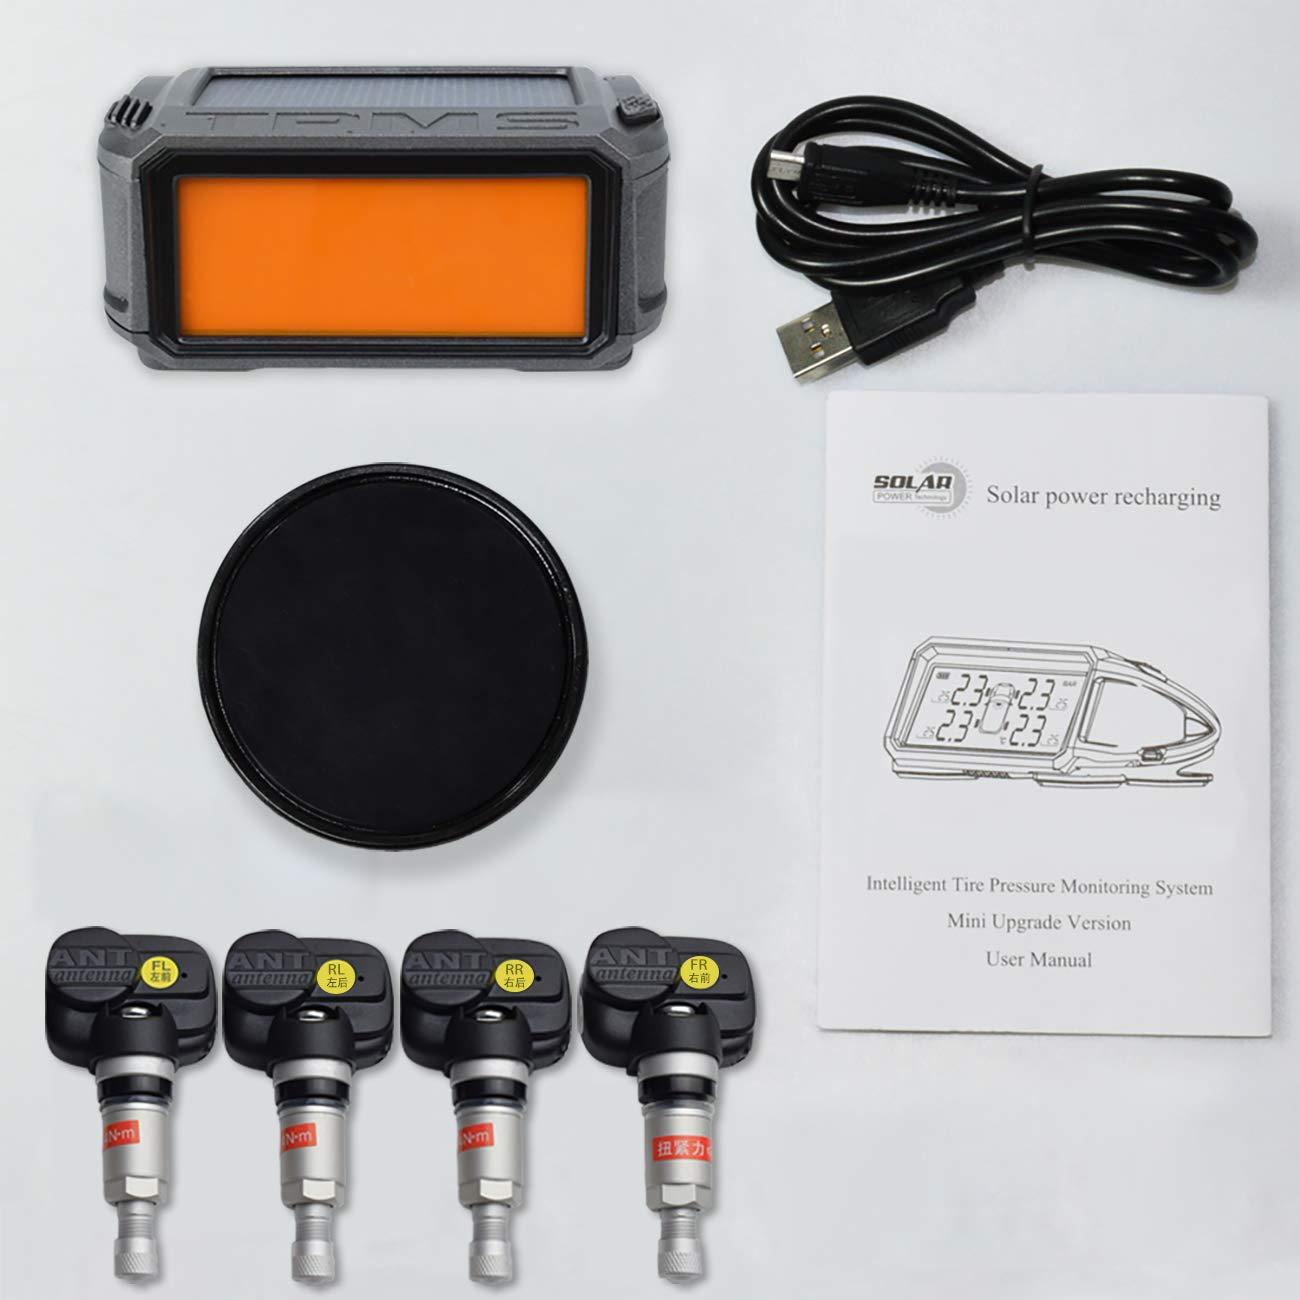 5Pcs 6mm Black Shaft Hole Dia bakelite Potentiometer Pot Pointer Knobs CapsHV